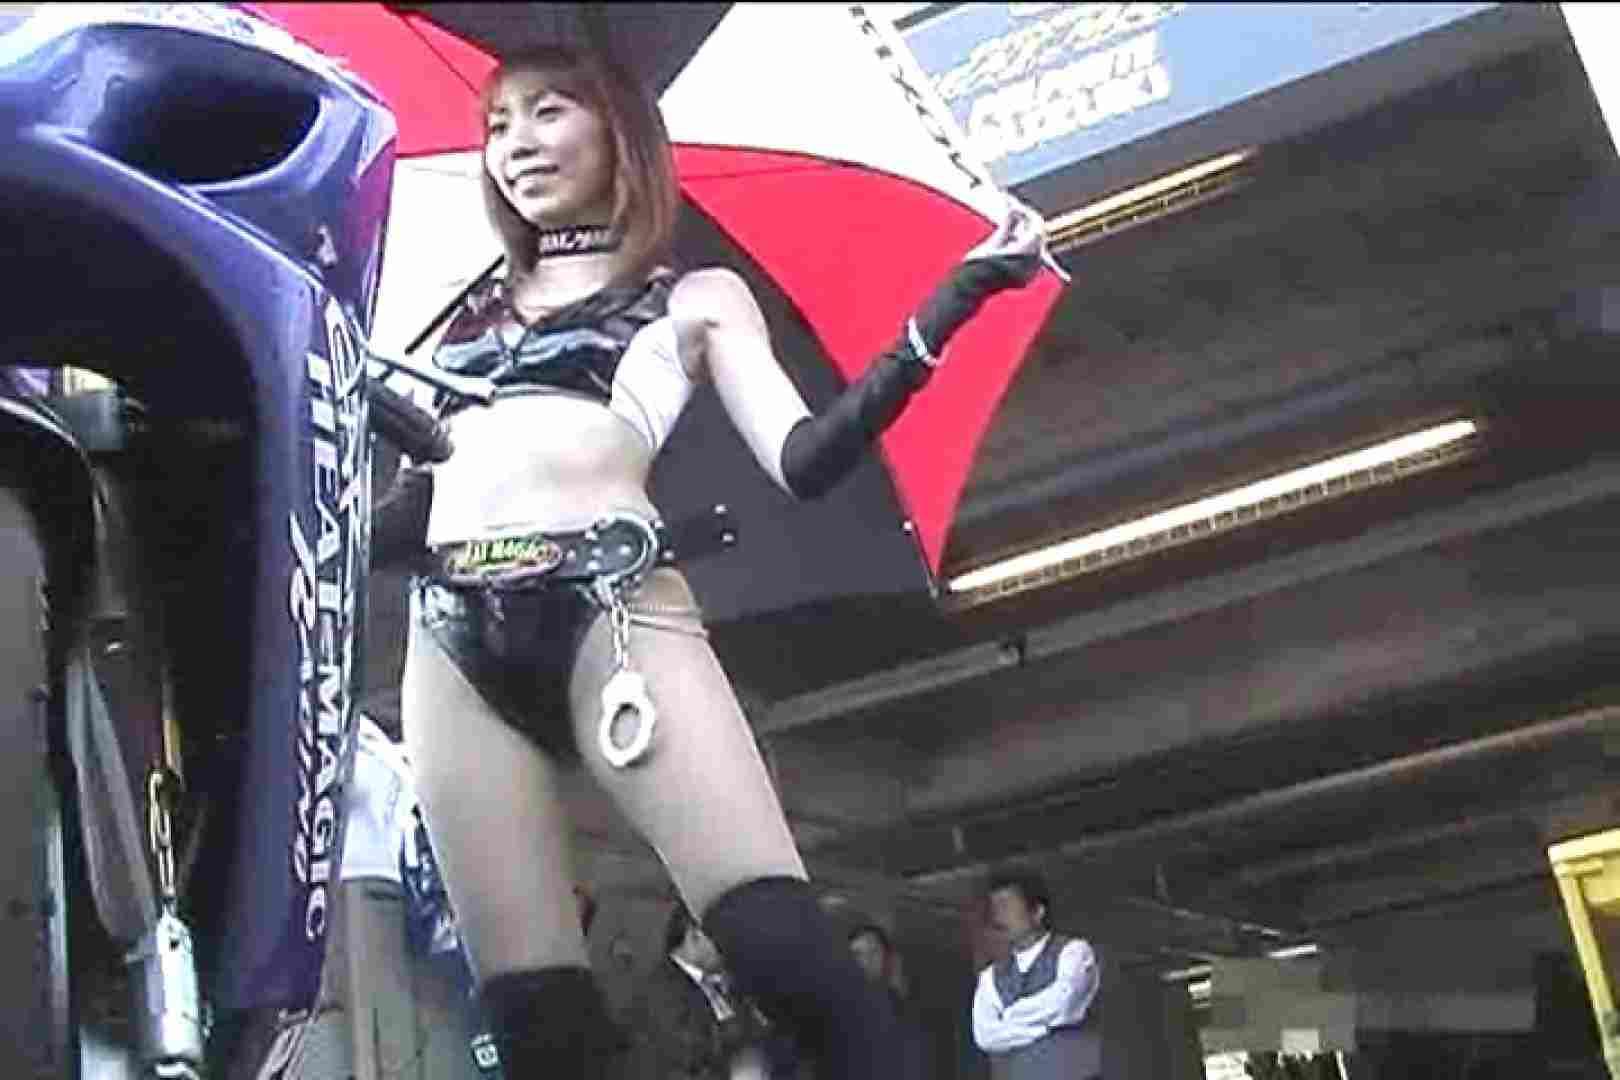 RQカメラ地獄Vol.14 美女OL   レースクイーン  42連発 23